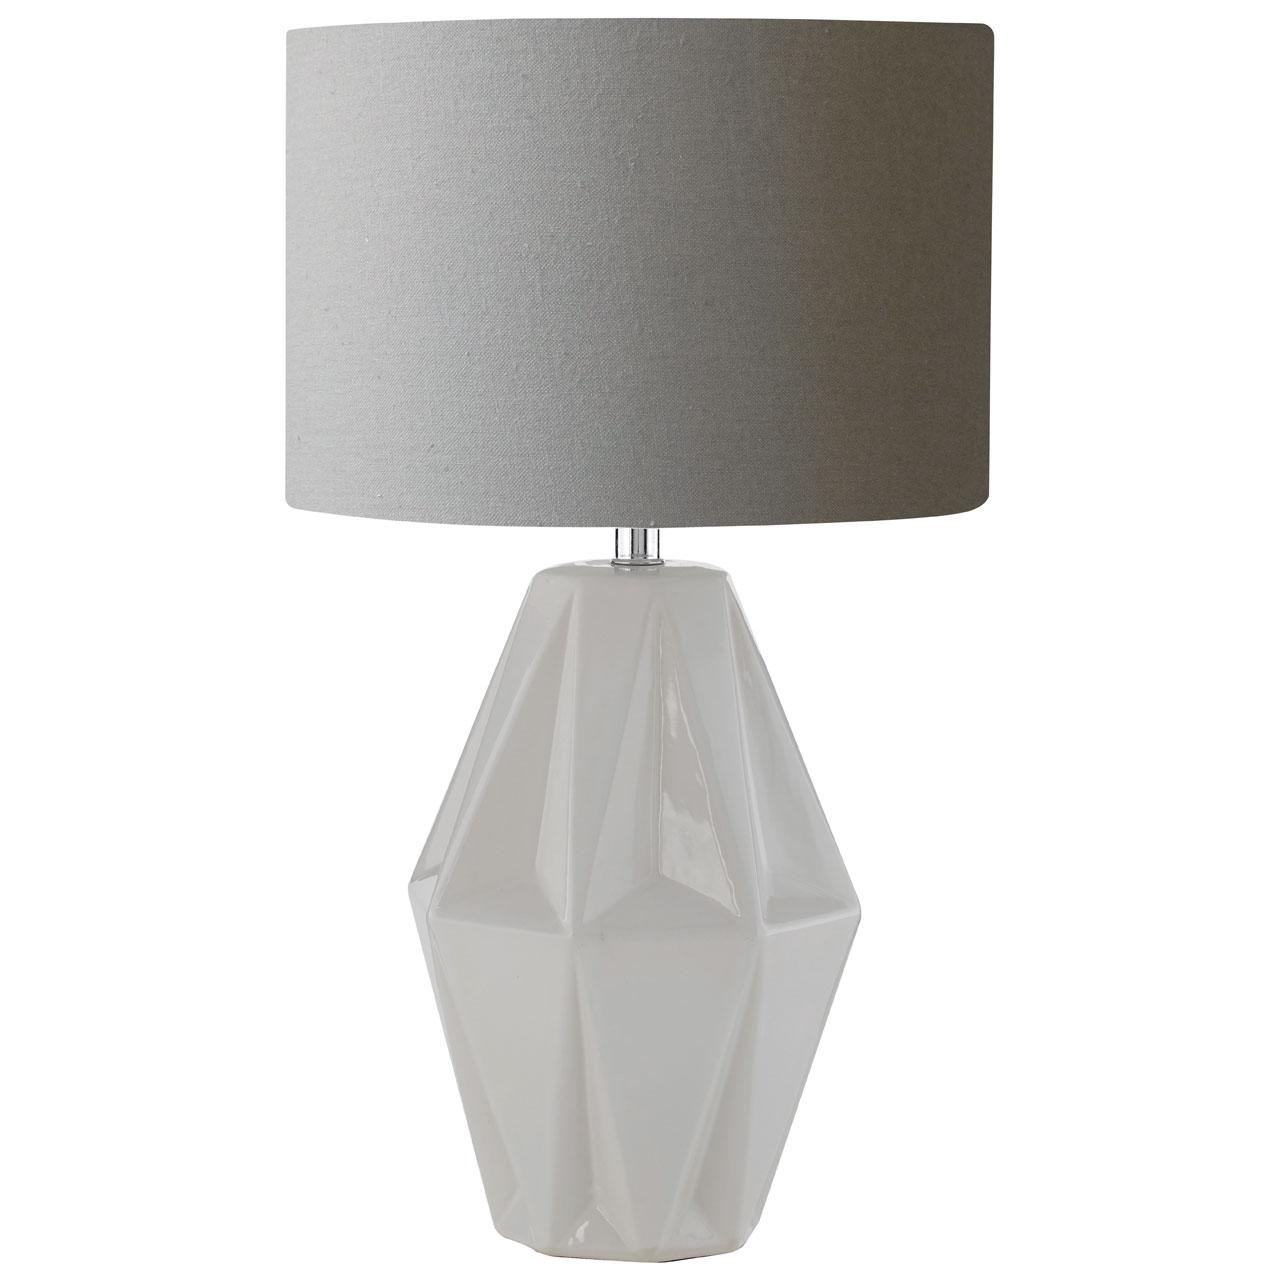 jenna table desk lamp grey ceramic base fabric shade living room rh ebay co uk